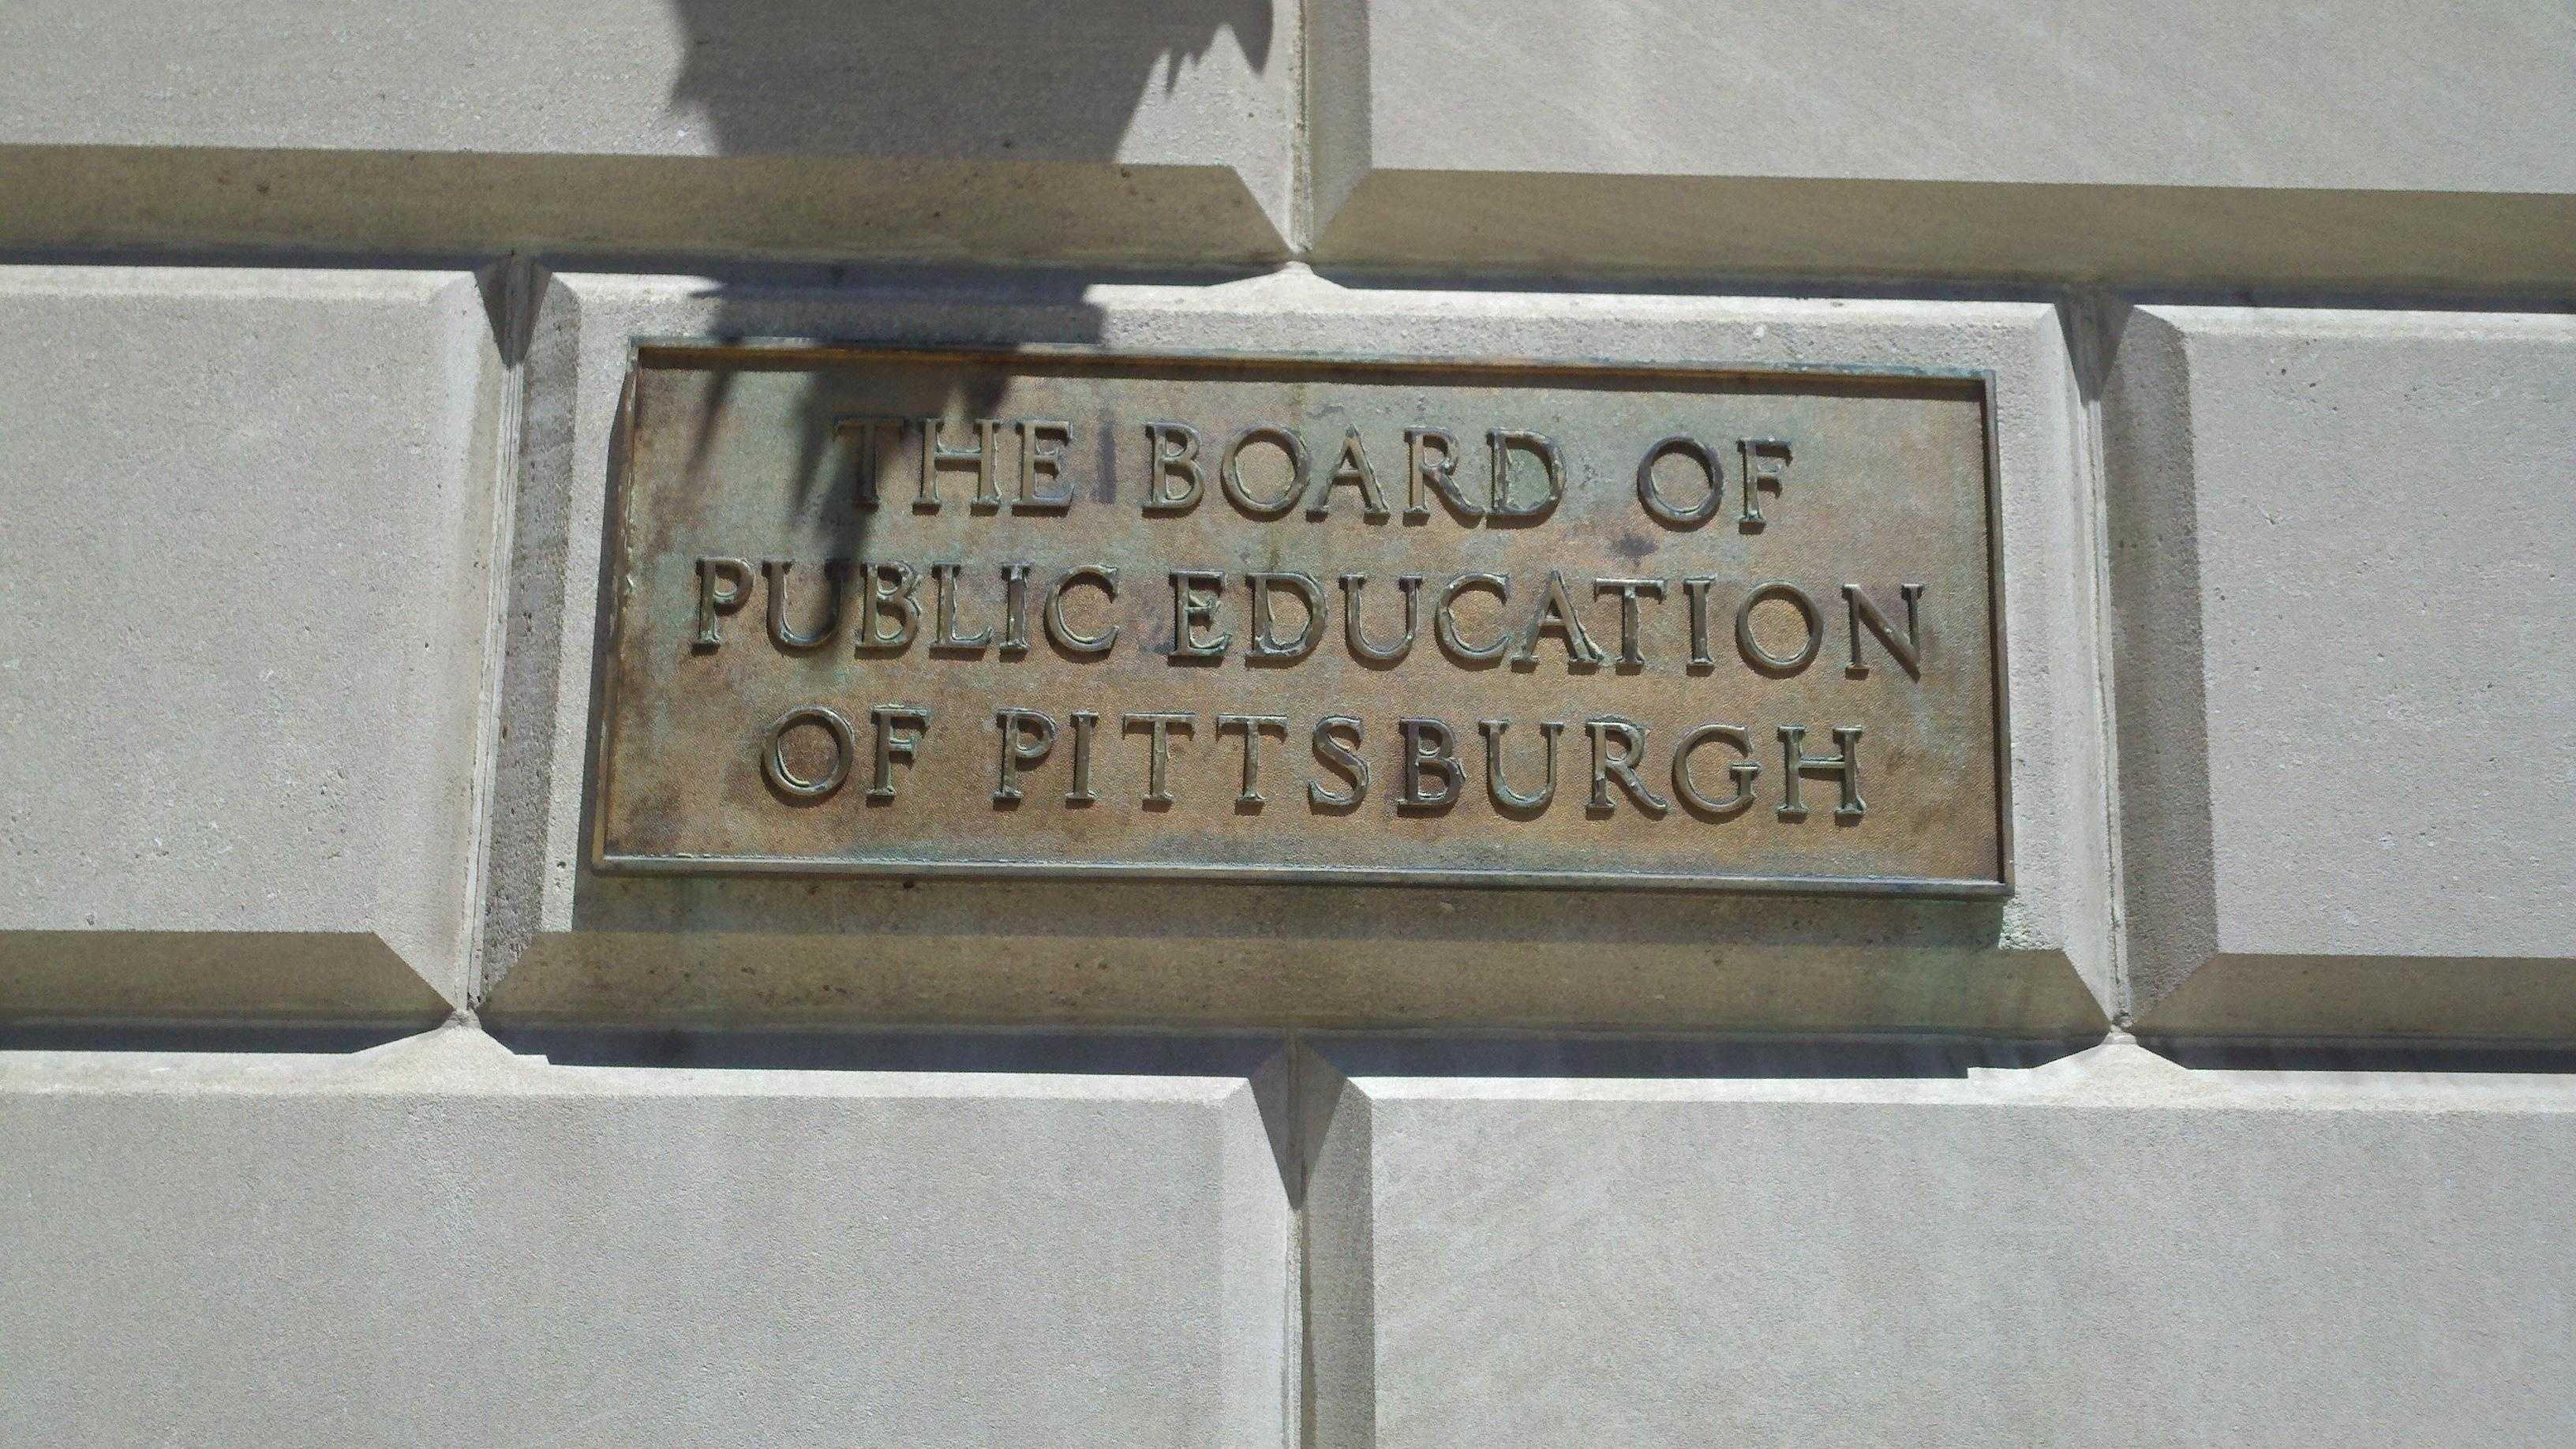 Pittsburgh Public Schools